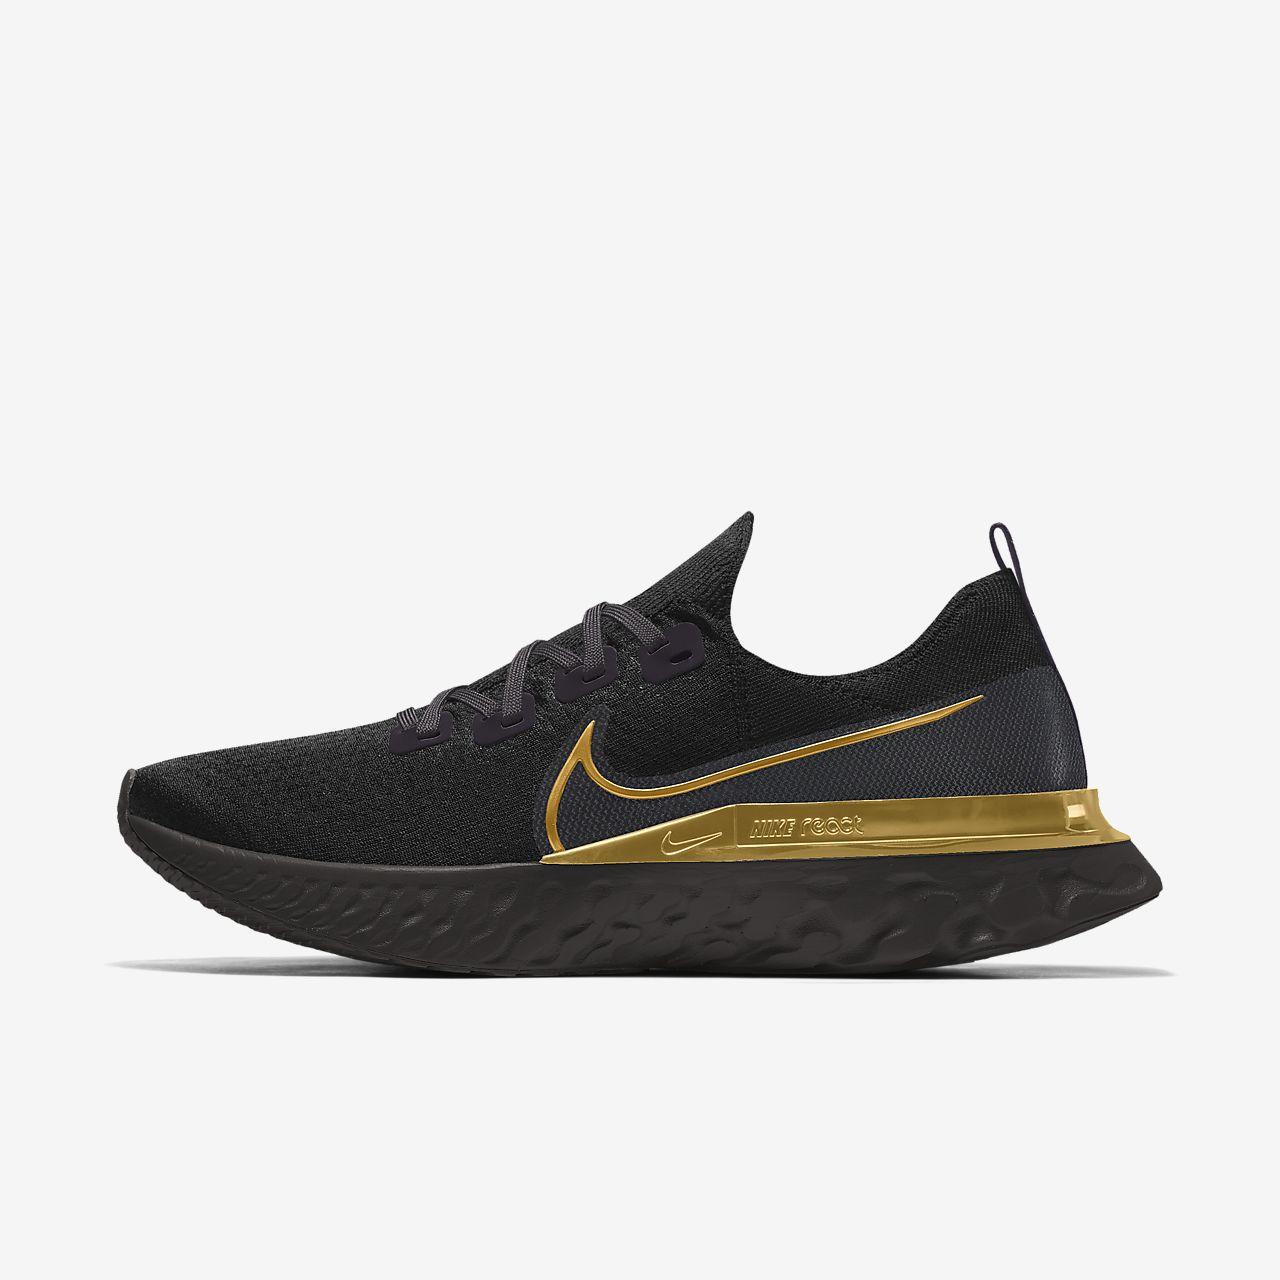 Custom Nike React Infinity Run Flyknit By You-løbesko til kvinder